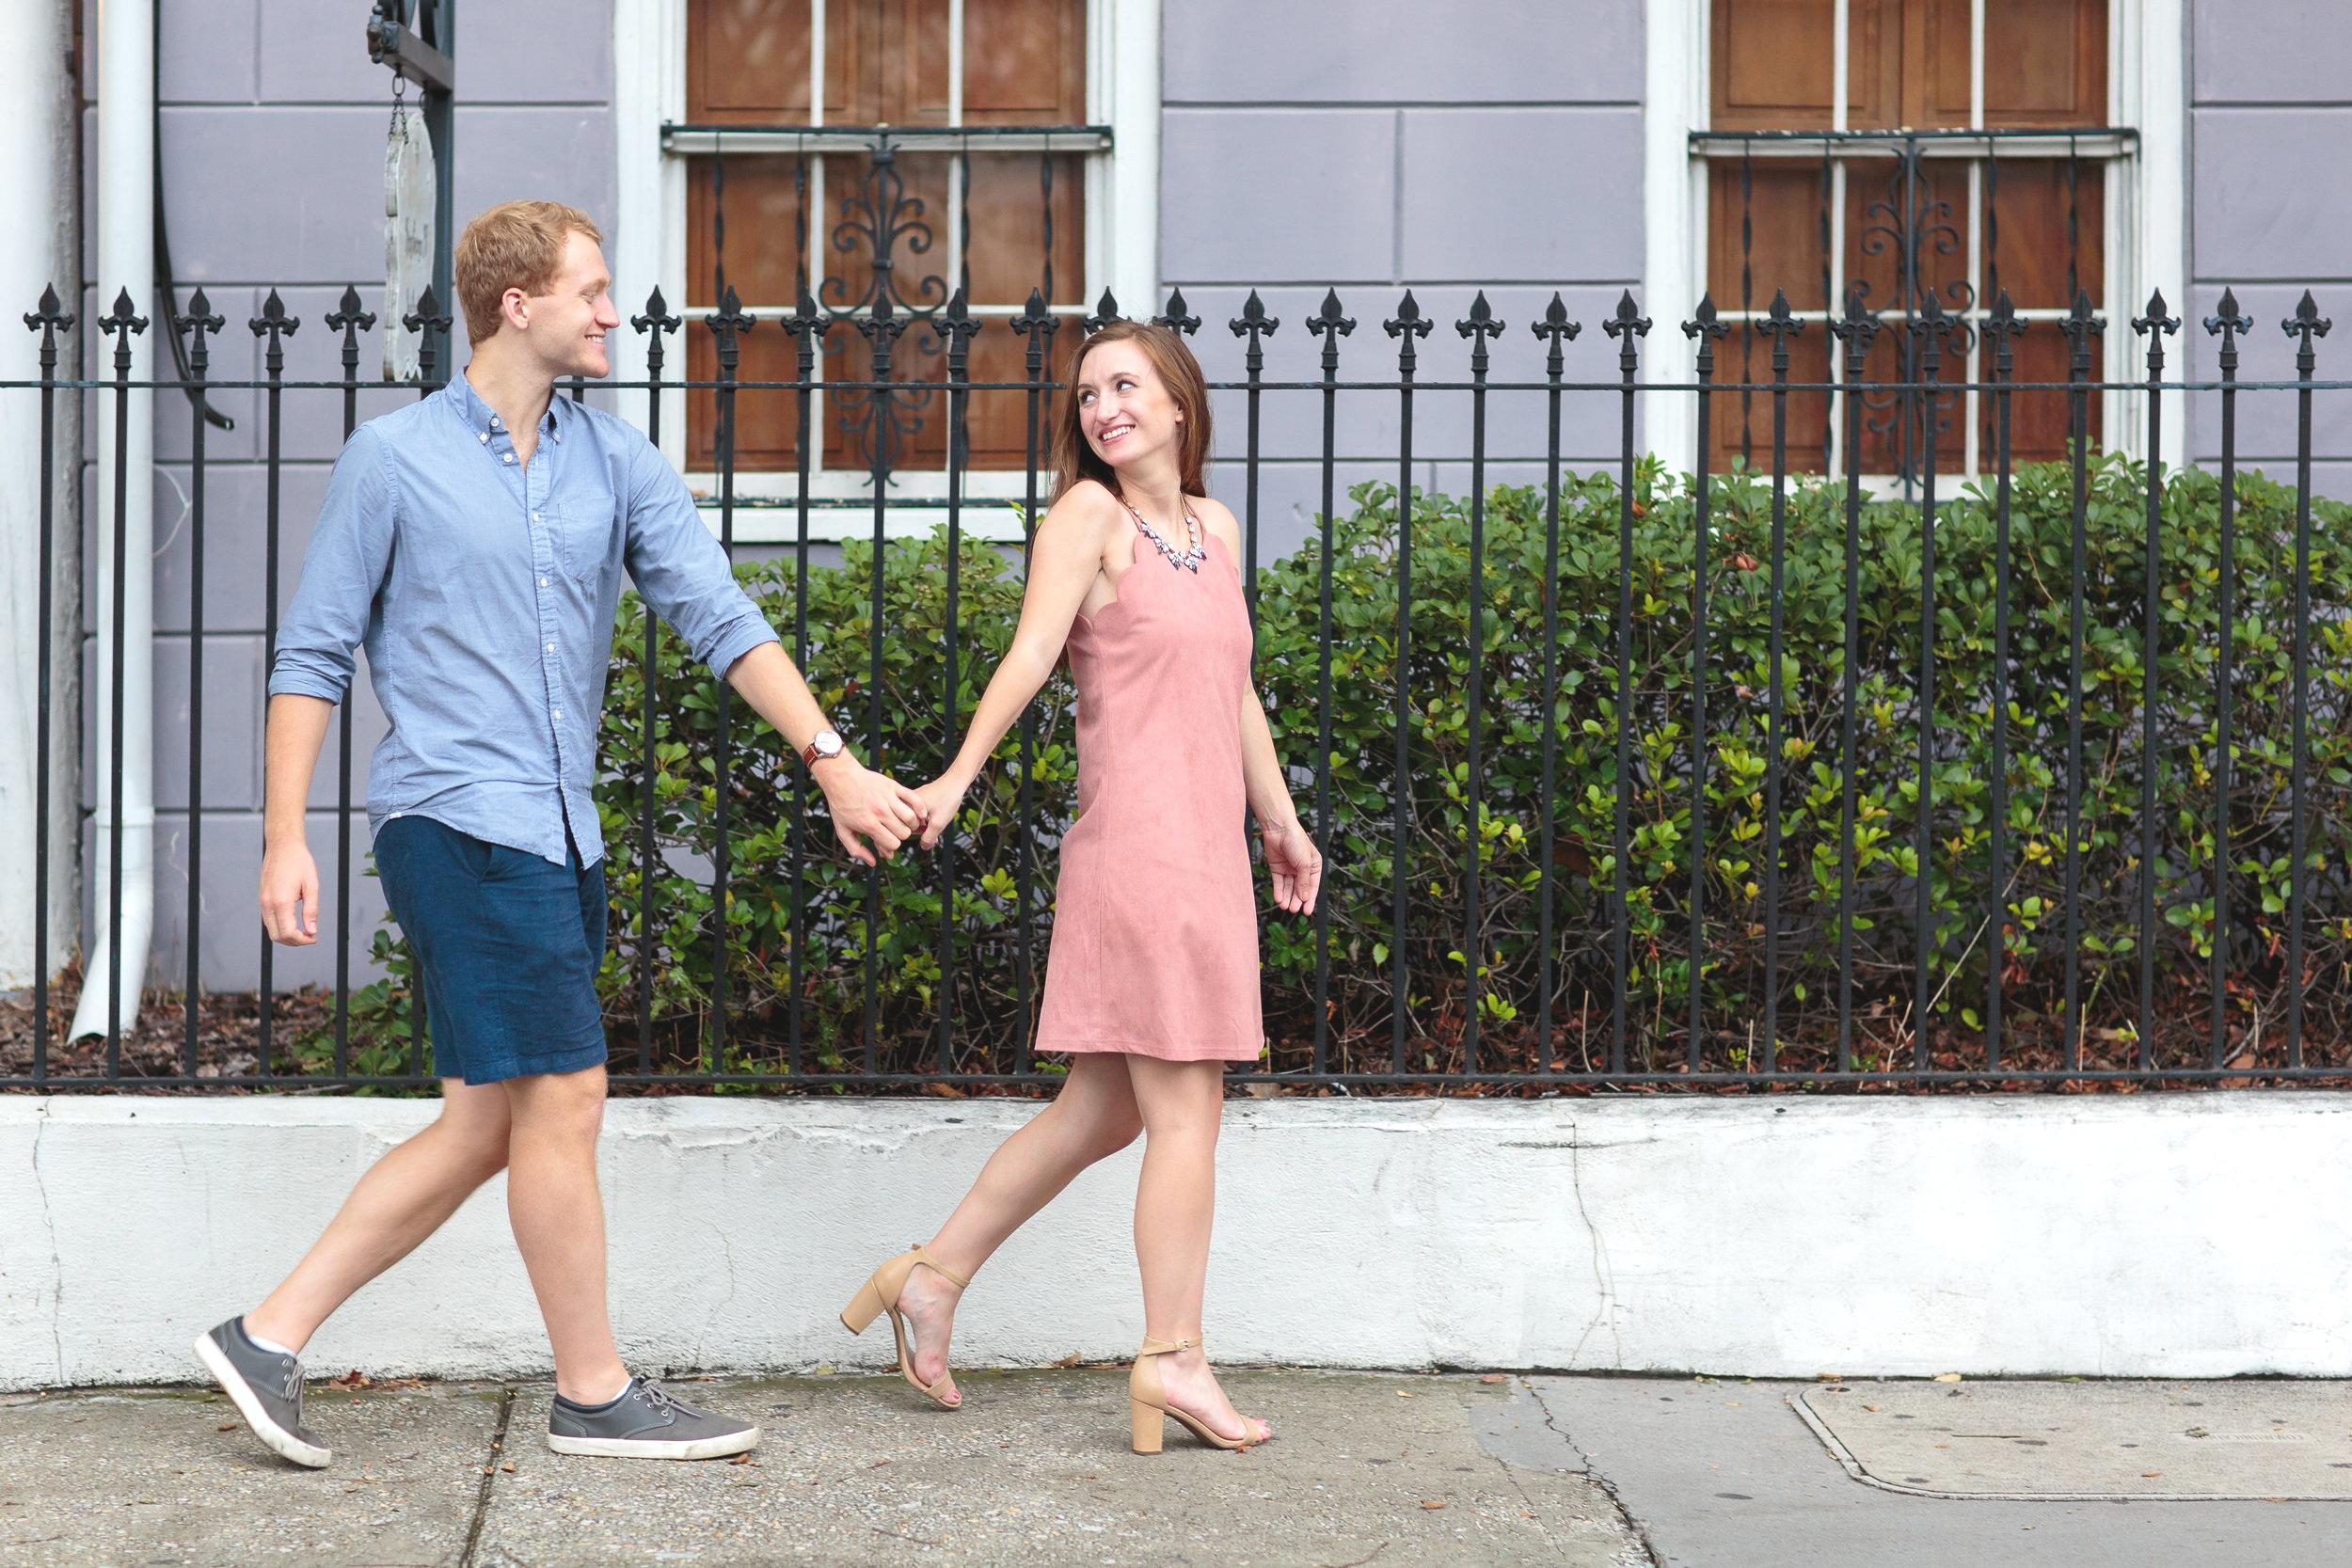 Holly and Mark-Holly and Mark-0002.jpg